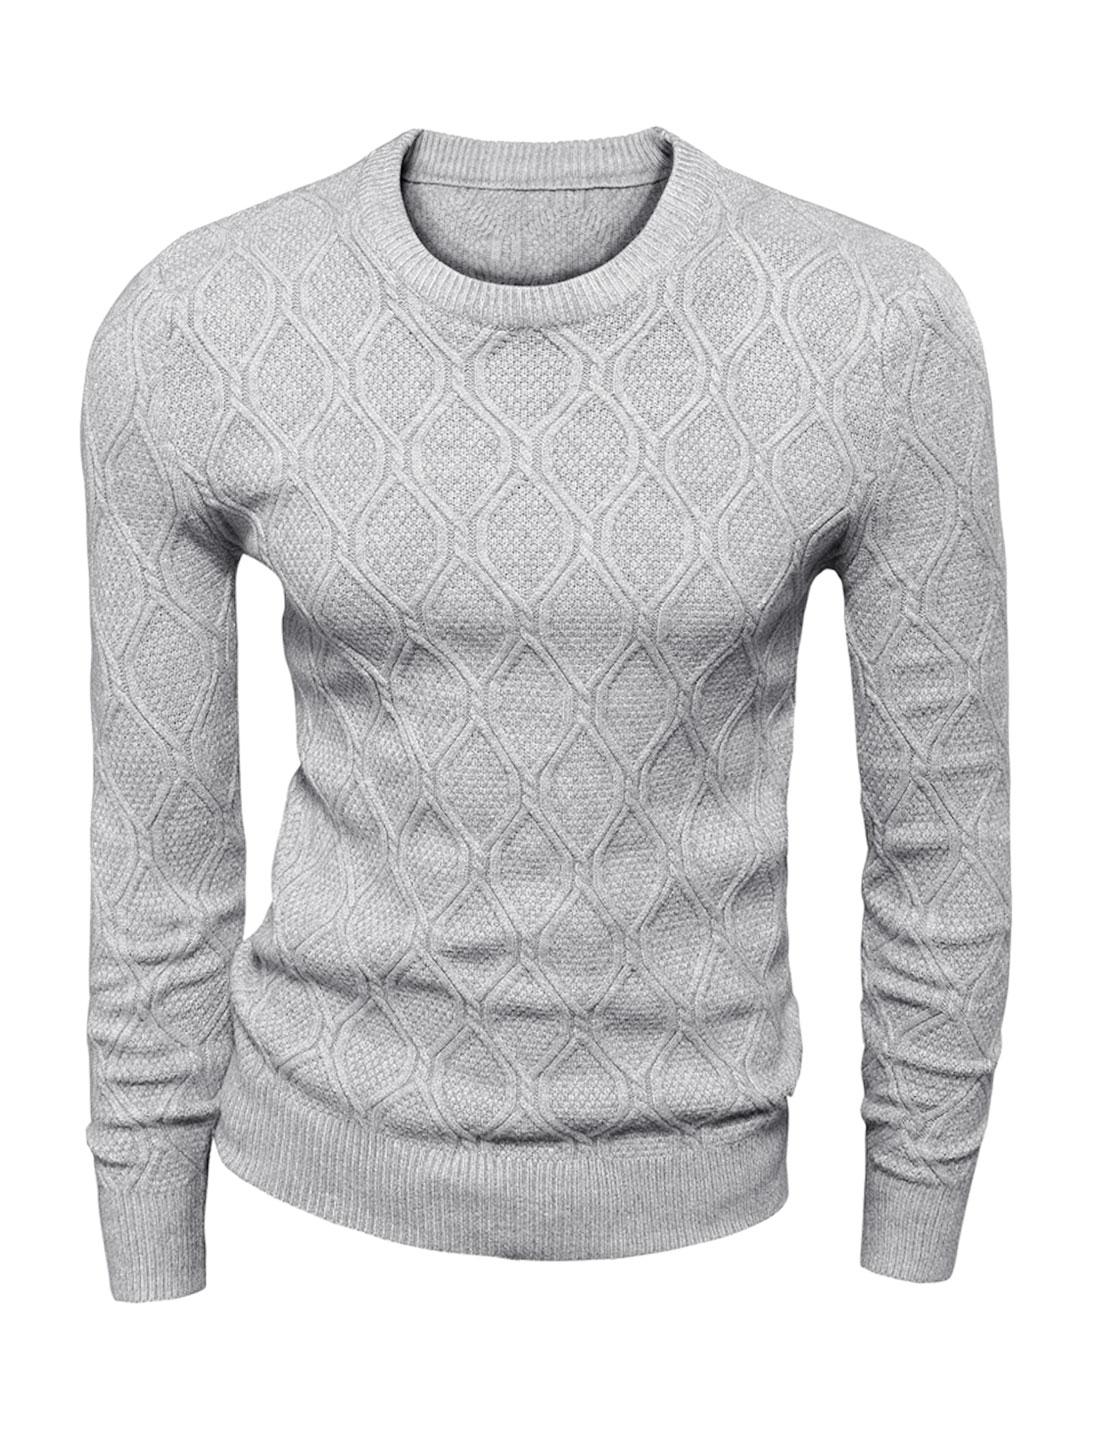 Men Crew Neck Long Sleeves Textured Sweater Light Gray S